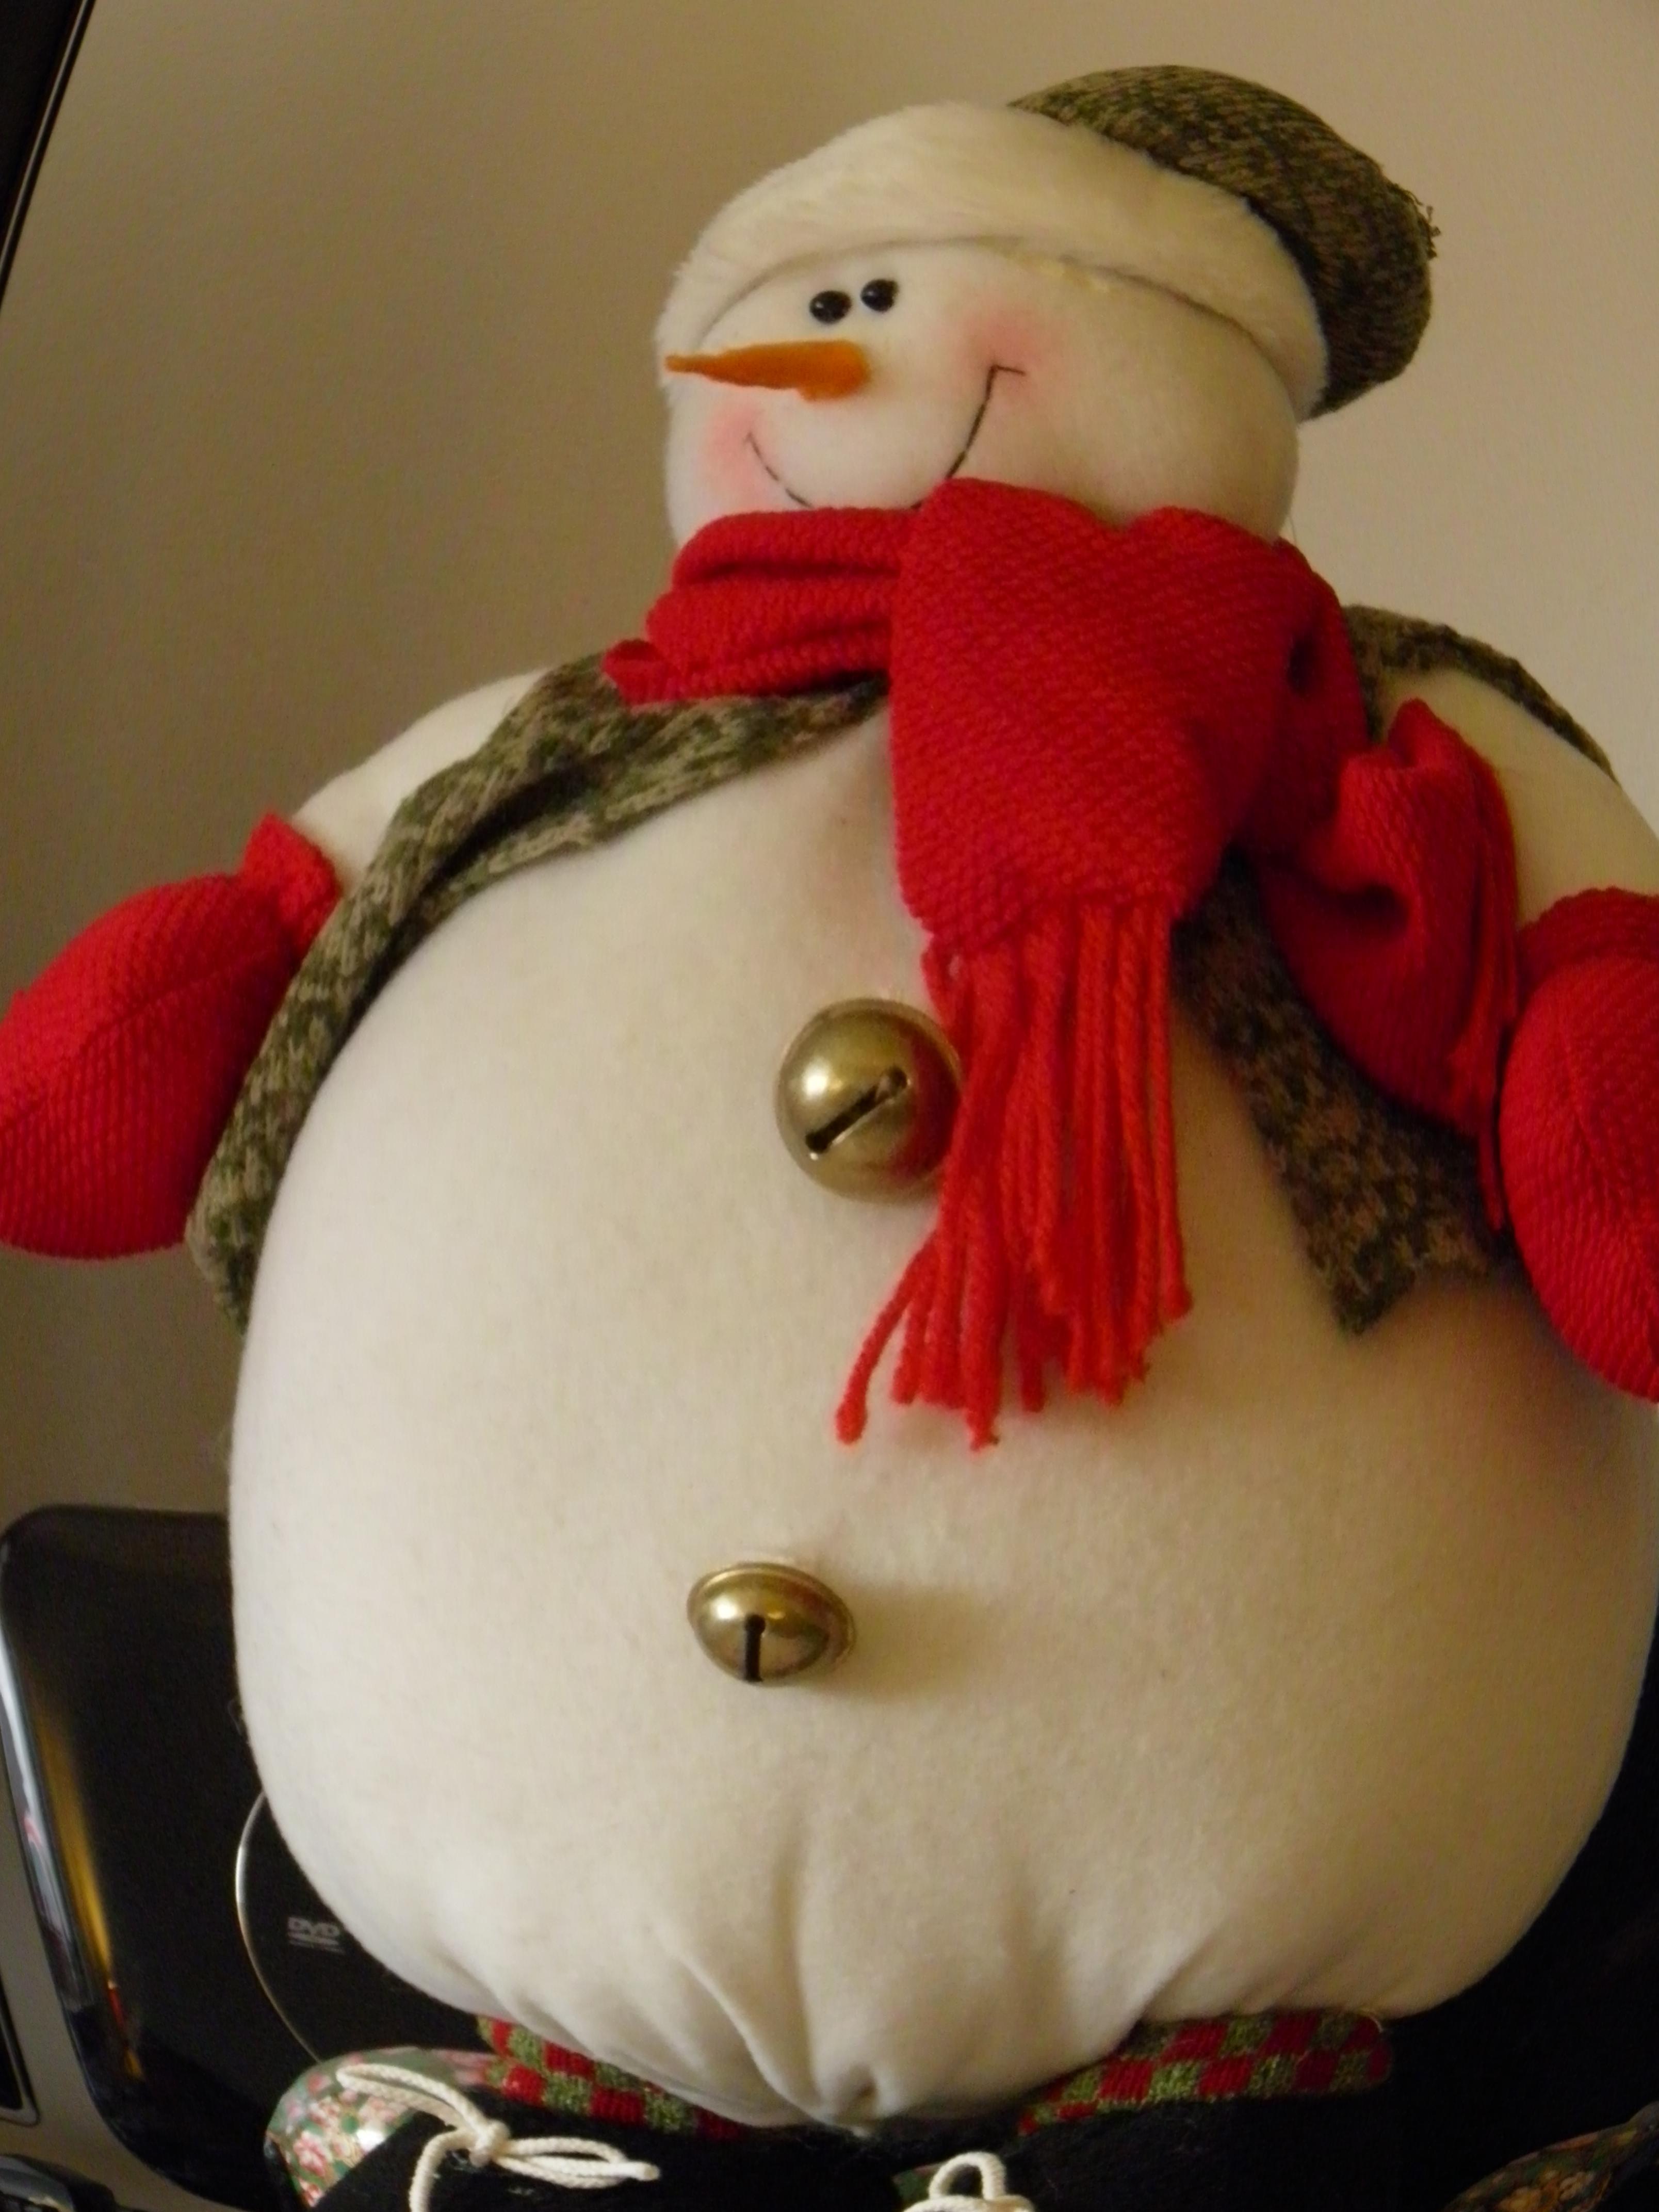 A Happy Festive Season To You All :-D